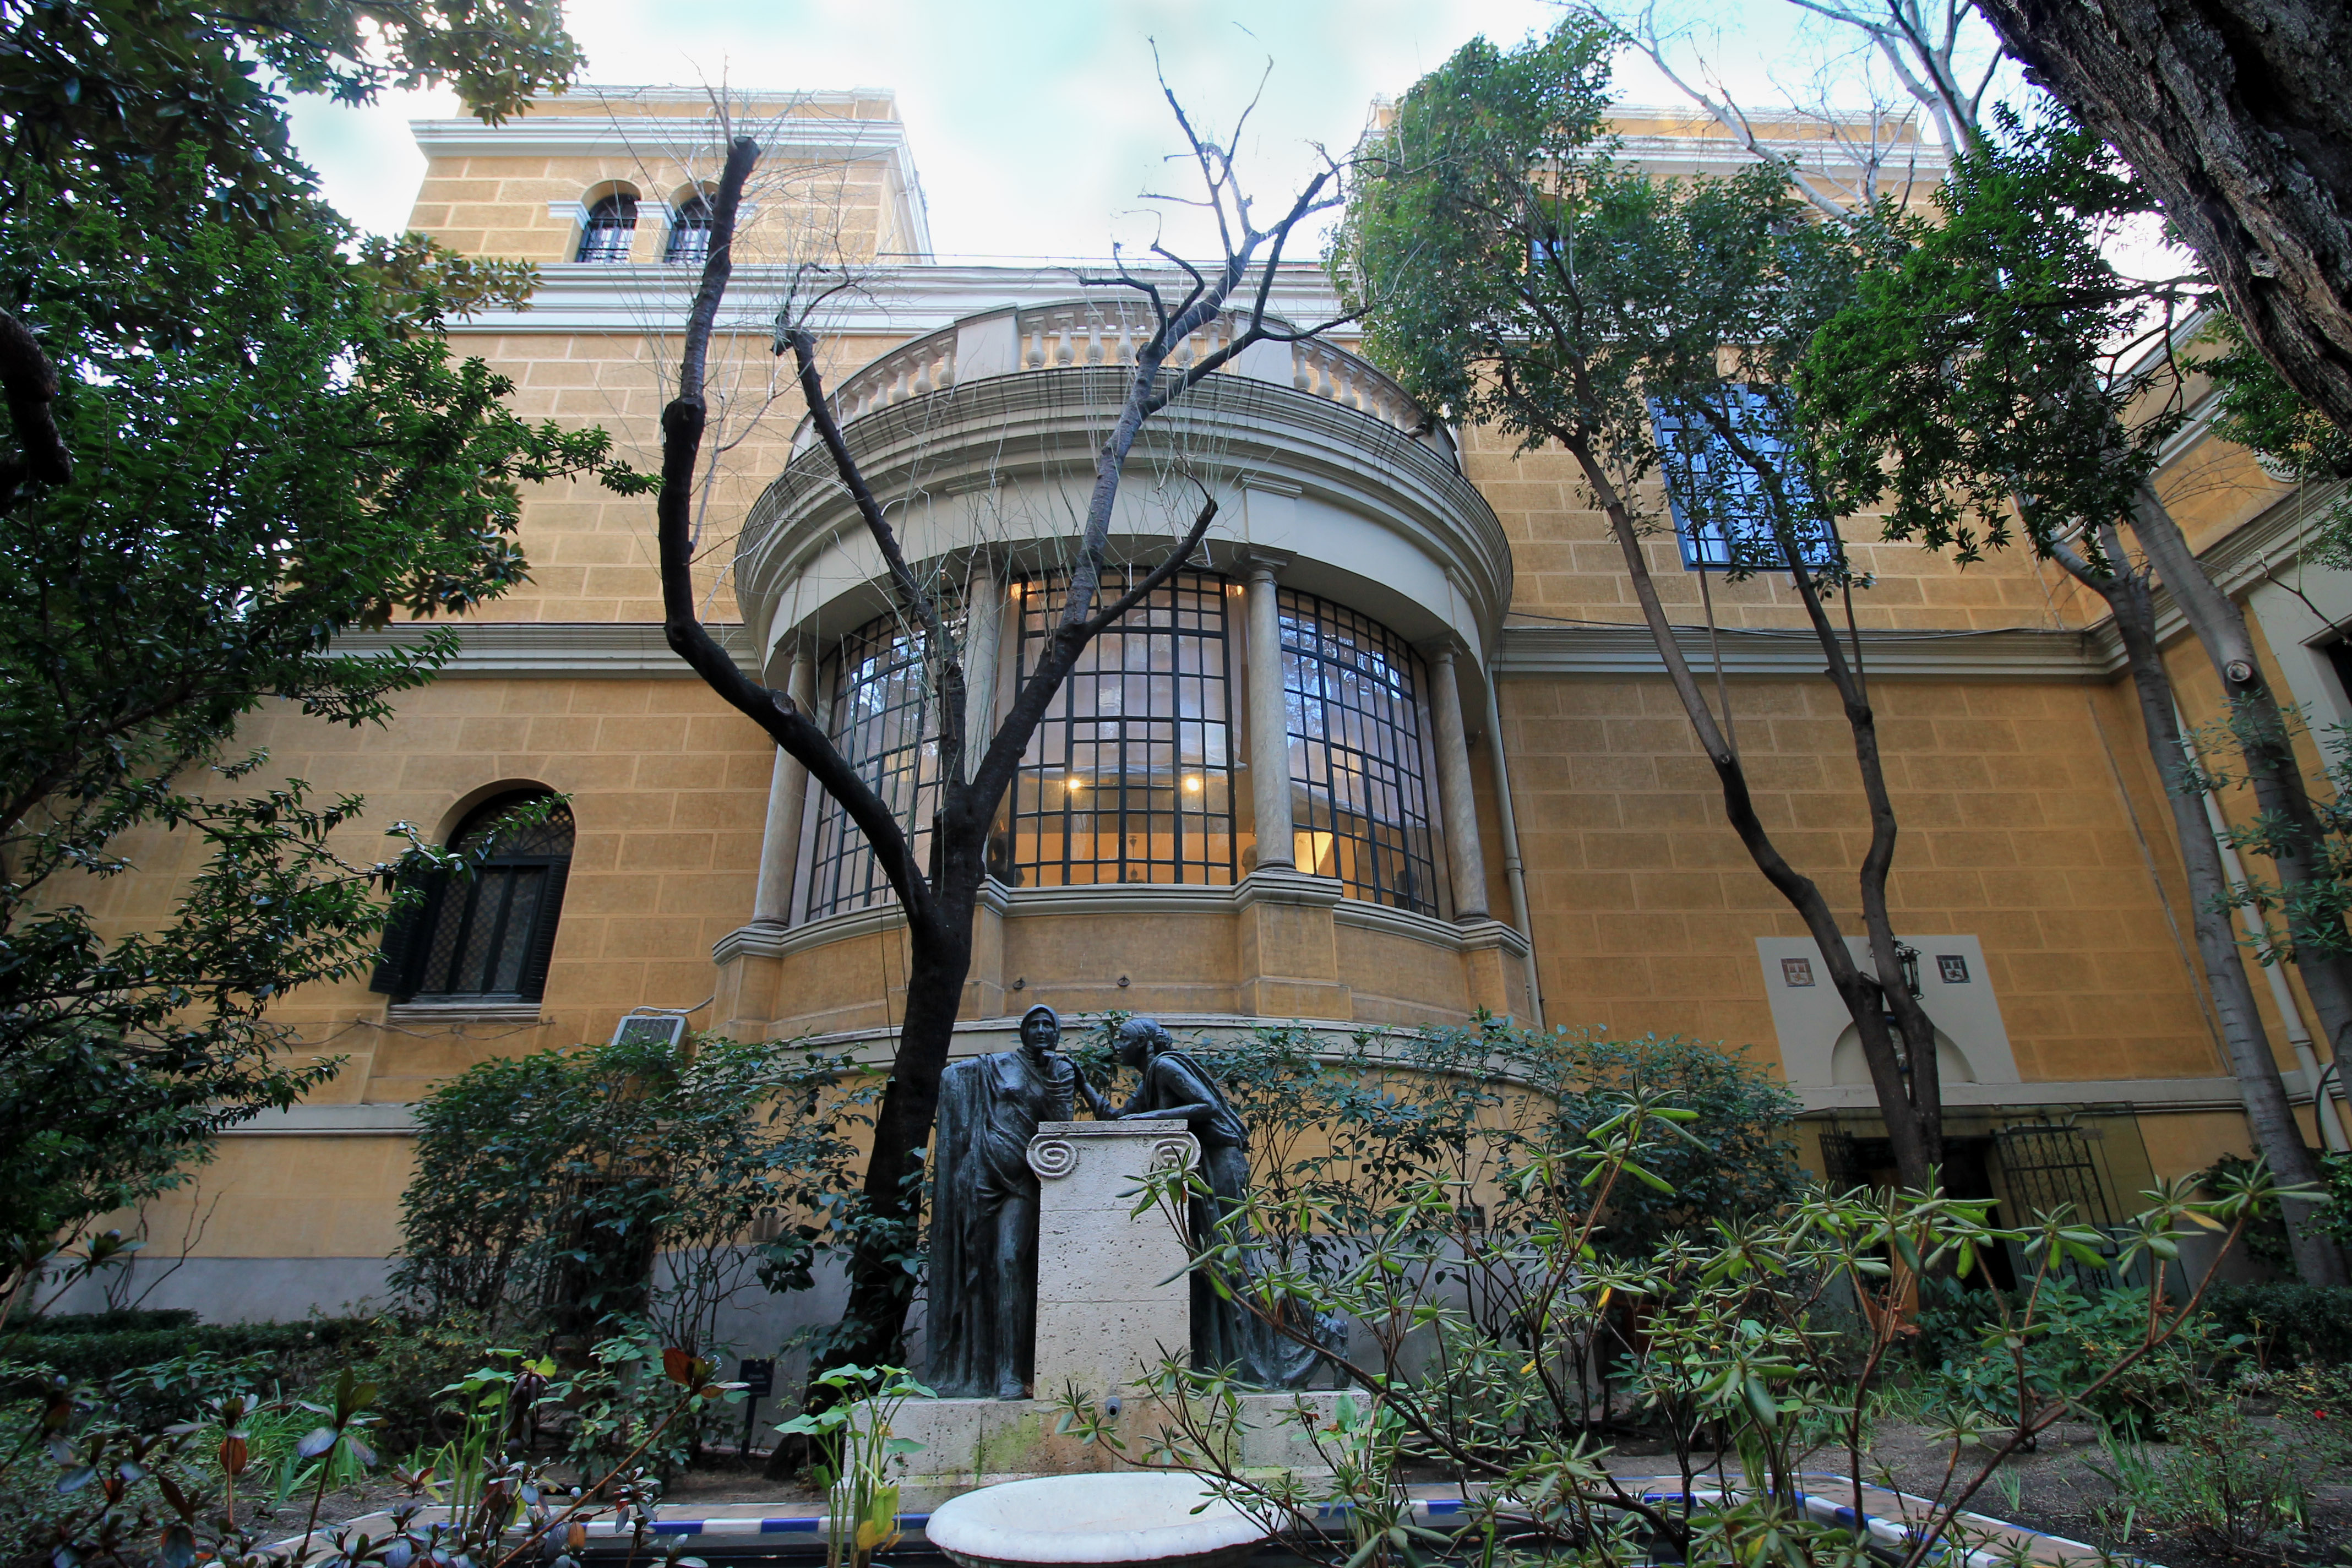 File:Museo Sorolla (Madrid) 08.jpg - Wikimedia Commons